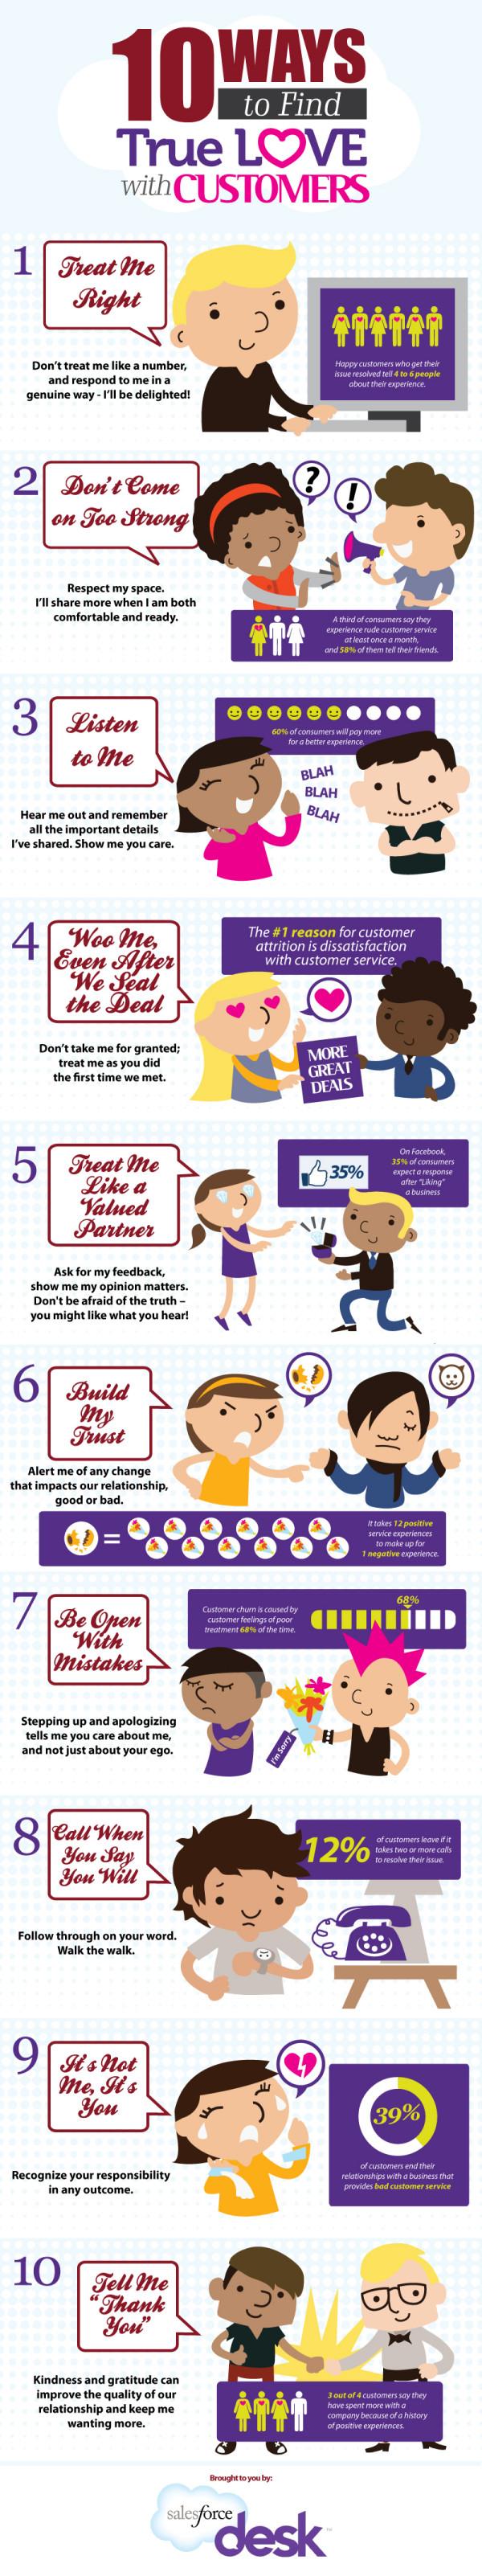 customer-service-training-infographic